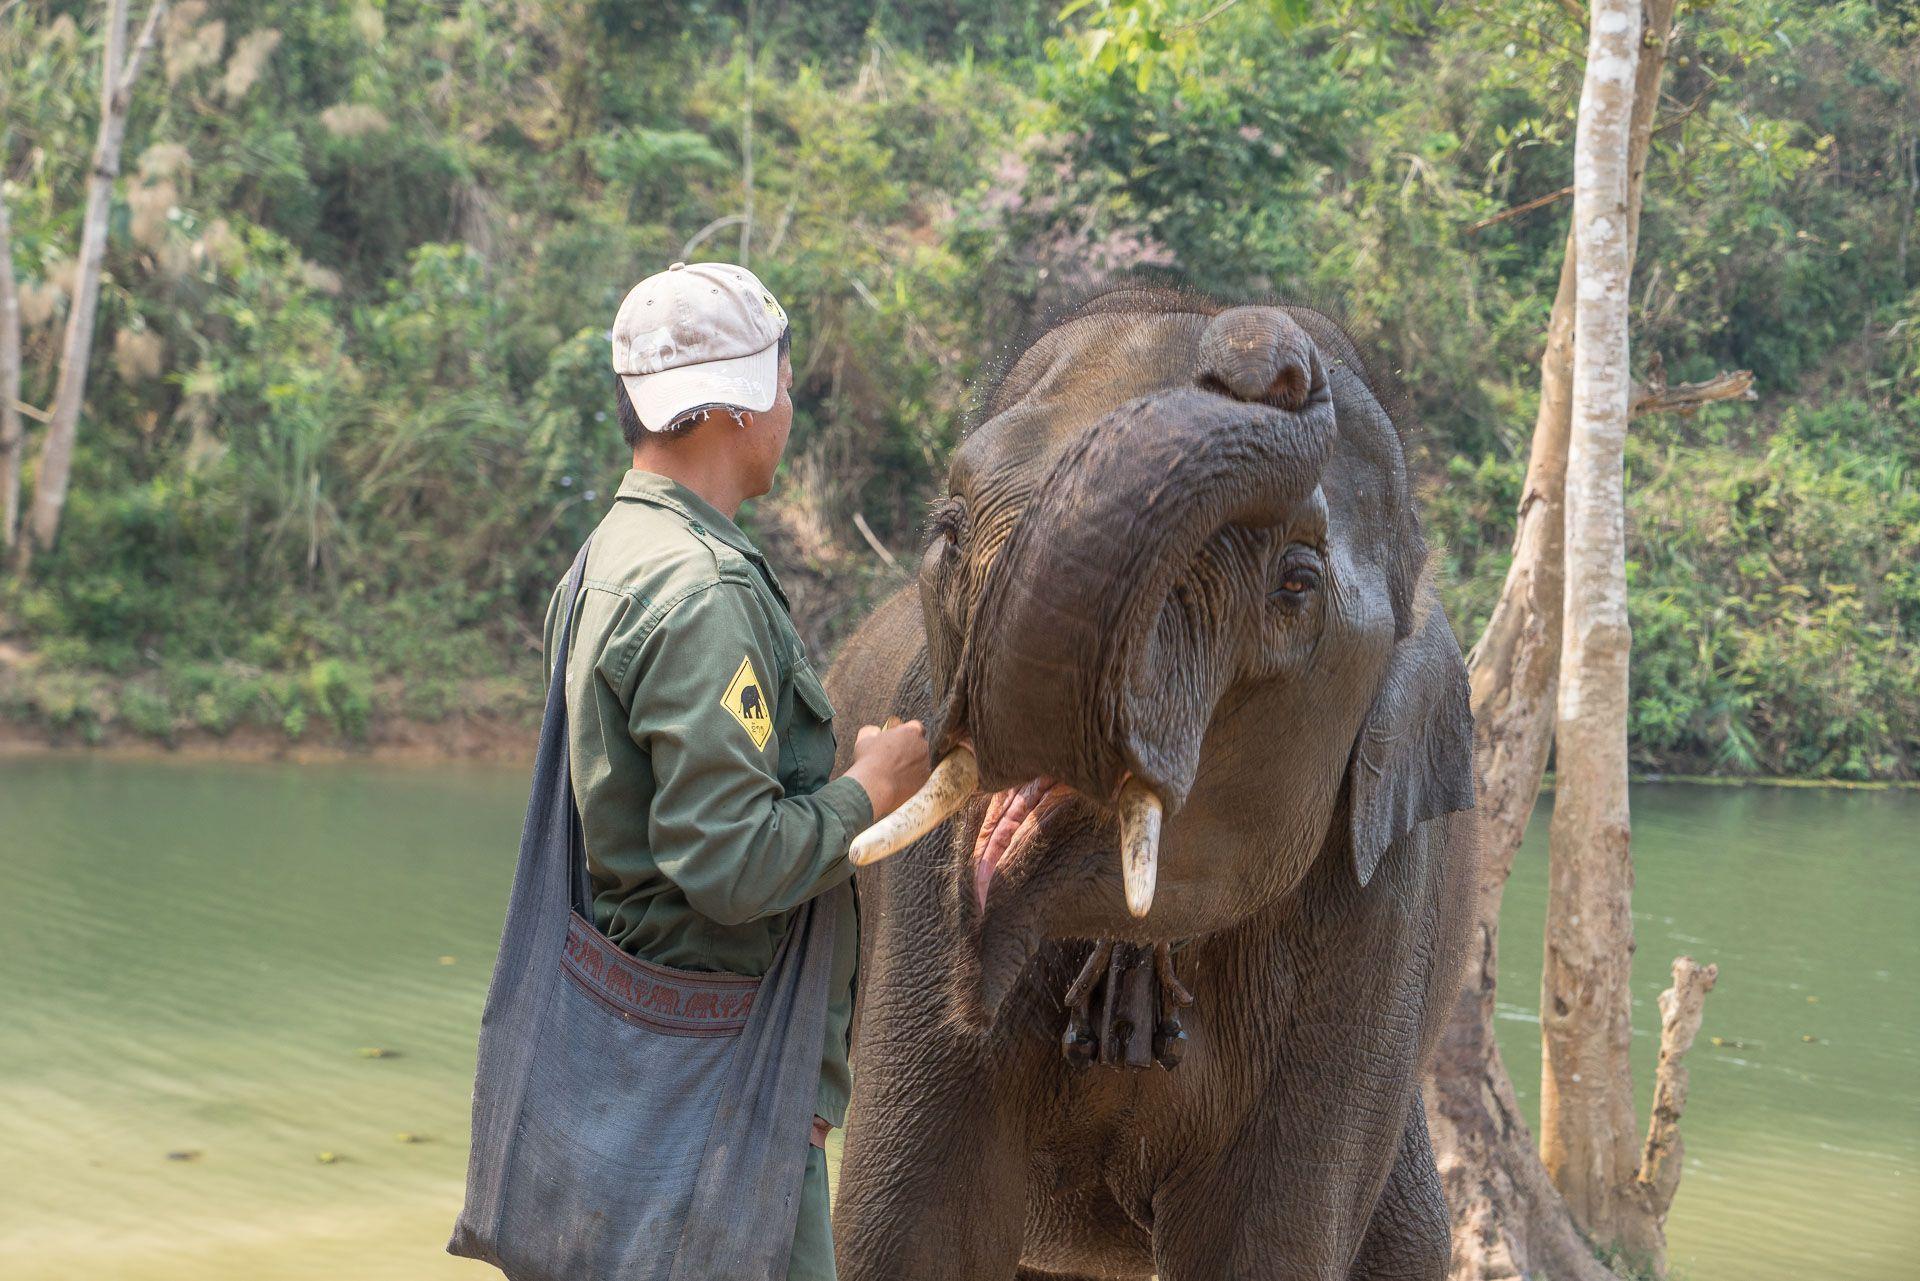 Lesvoyageuses-volontariat-centre-conservation-elephants-laos-105